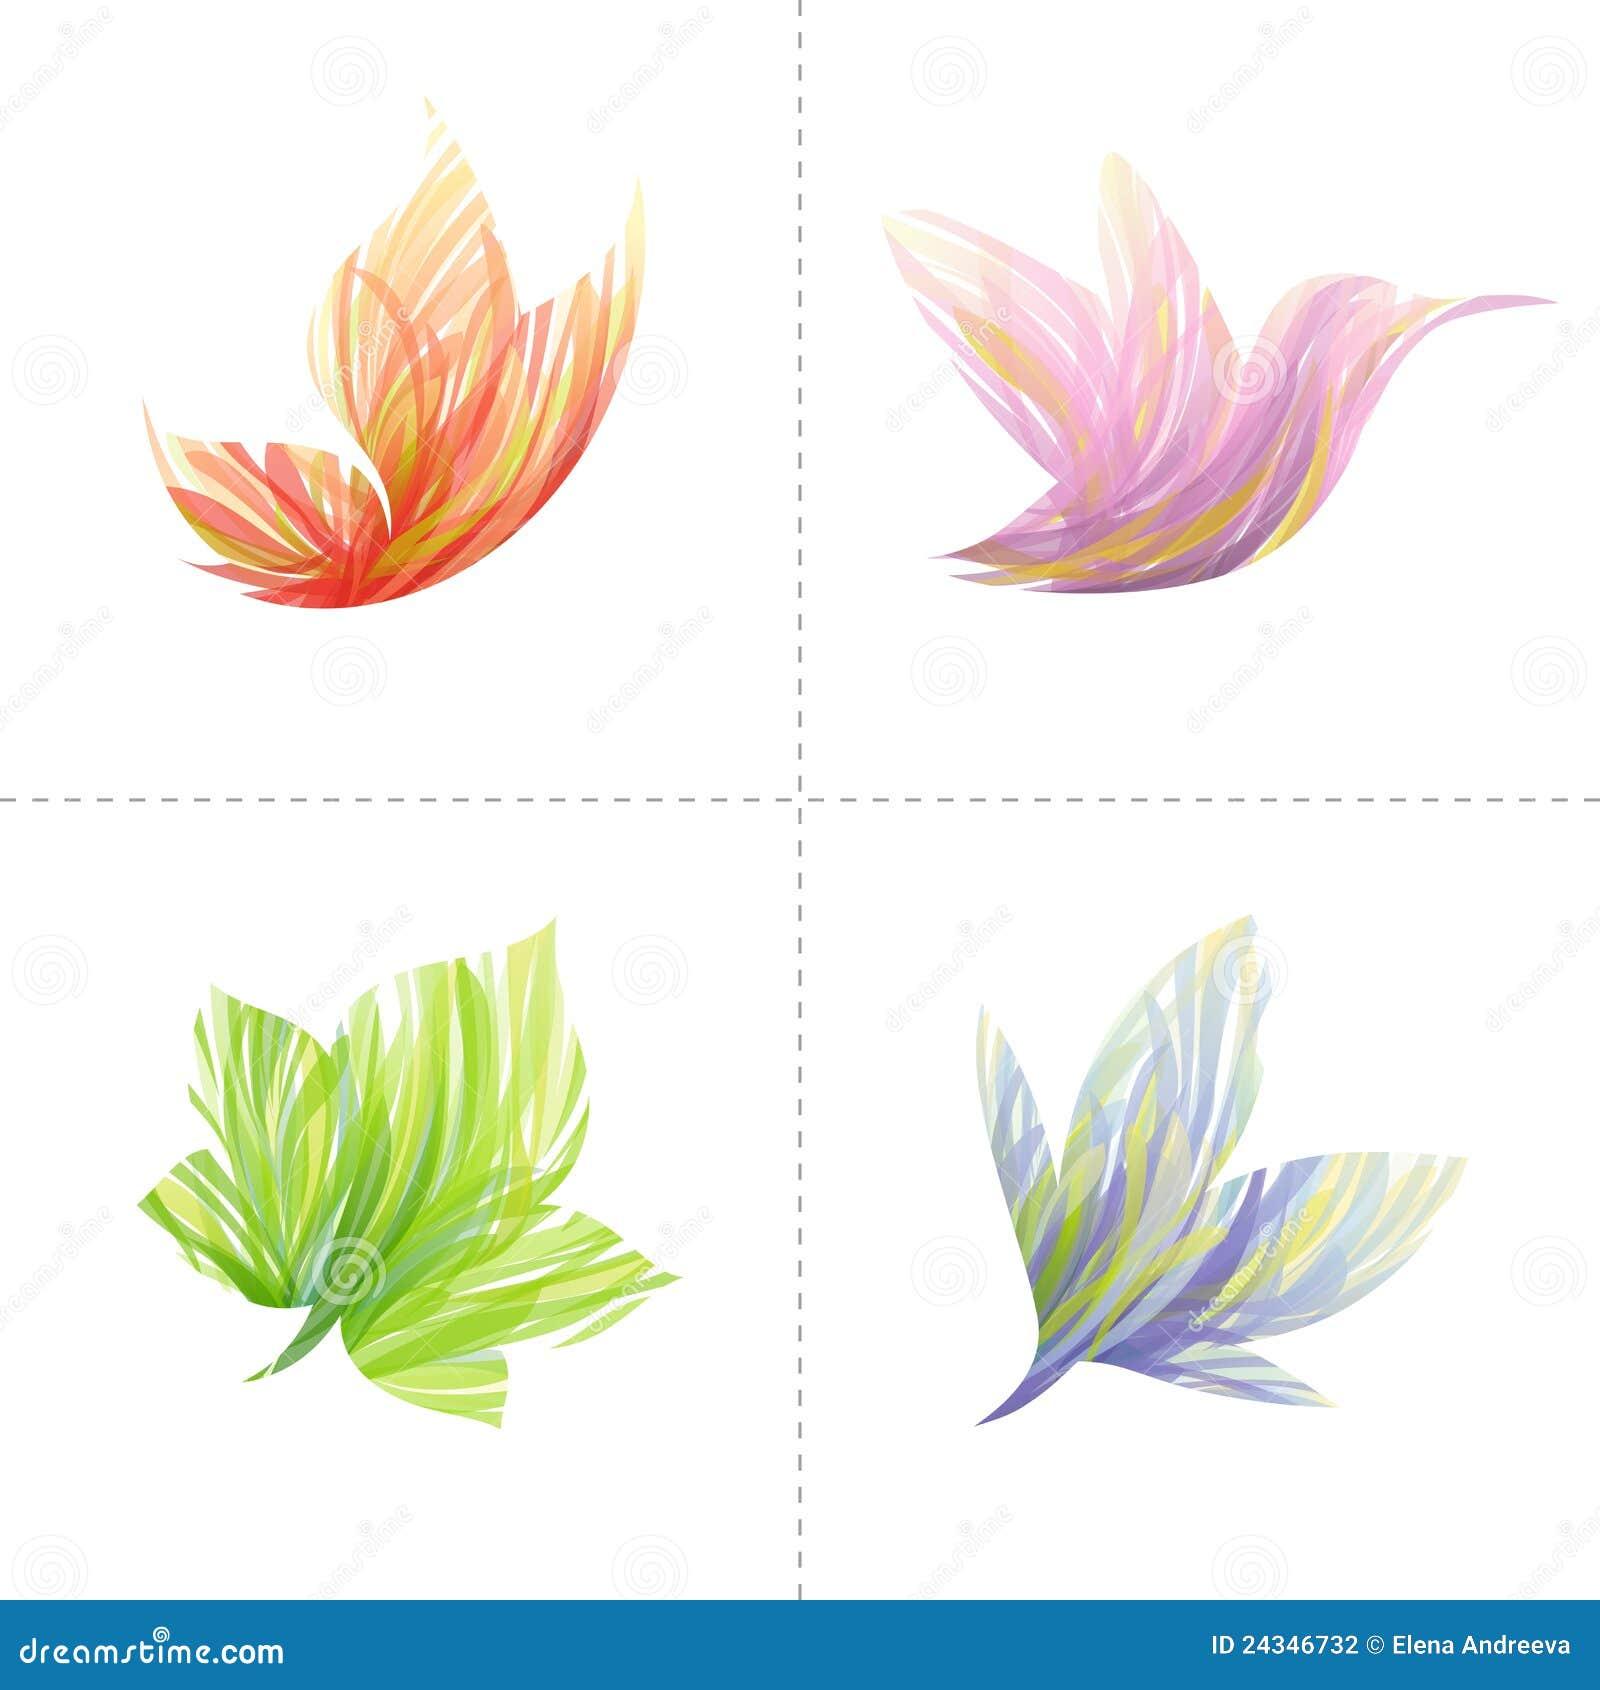 Design elements: butterfly, hummingbird, leaf, flo